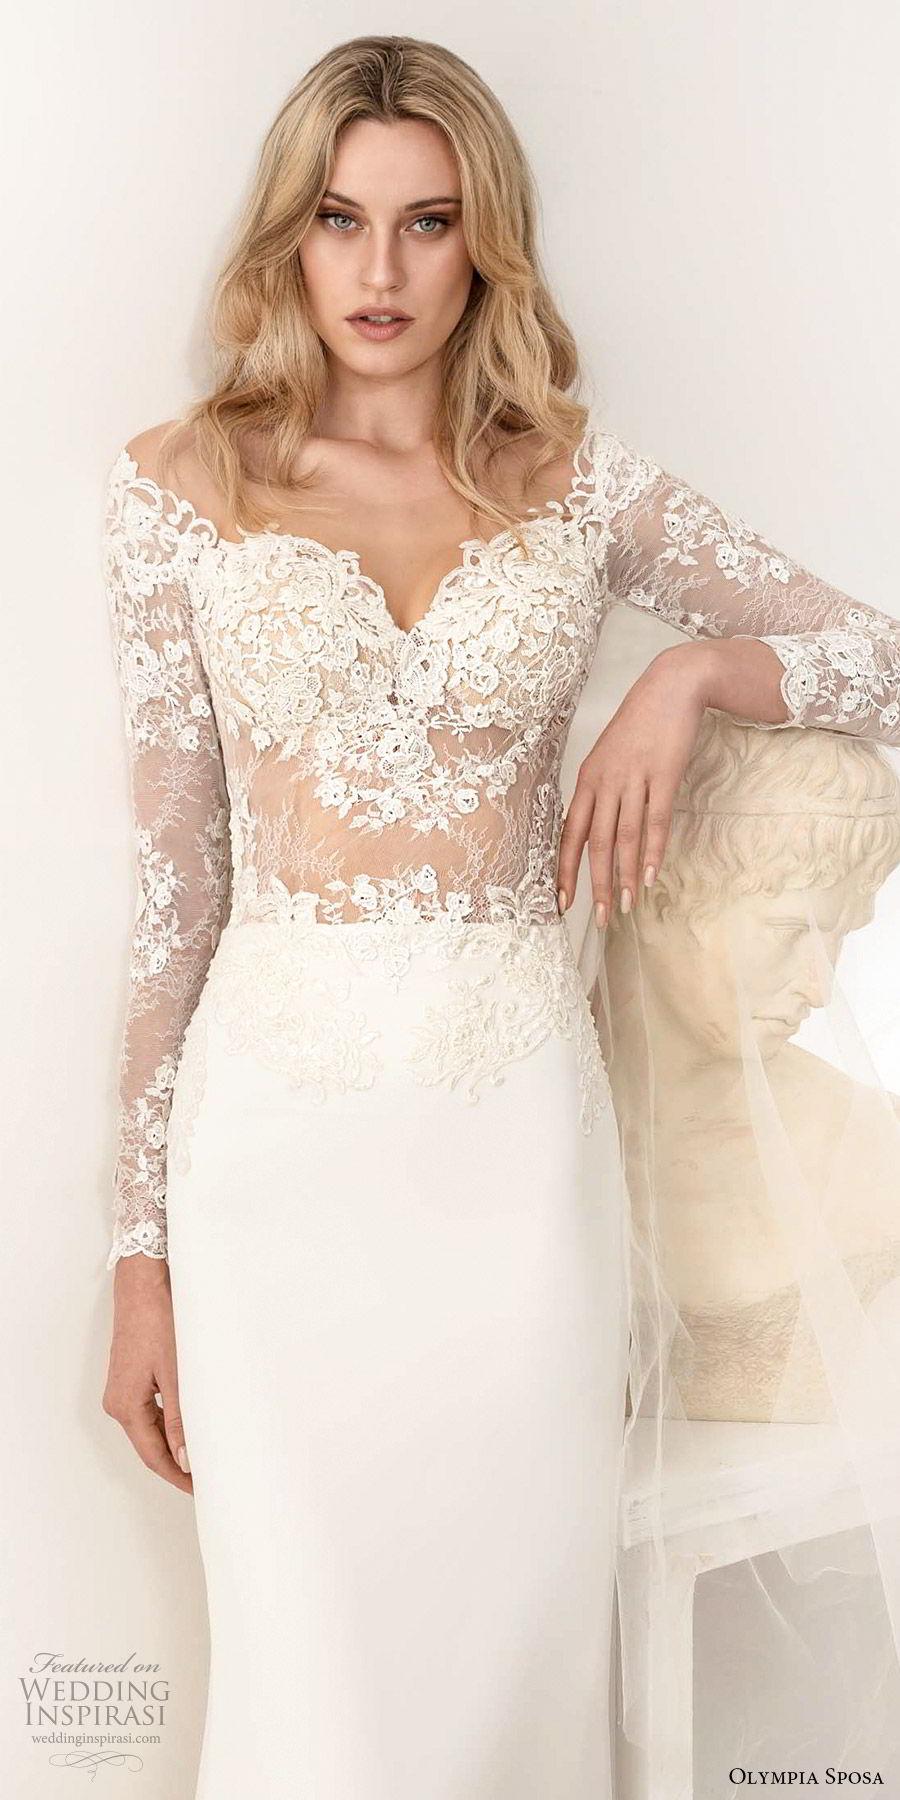 olympia sposa 2020 bridal illusion long sleeve off shoulder sweetheart sheer lace embellished bodice sheath wedding dress (2) elegant romantic chapel train zv